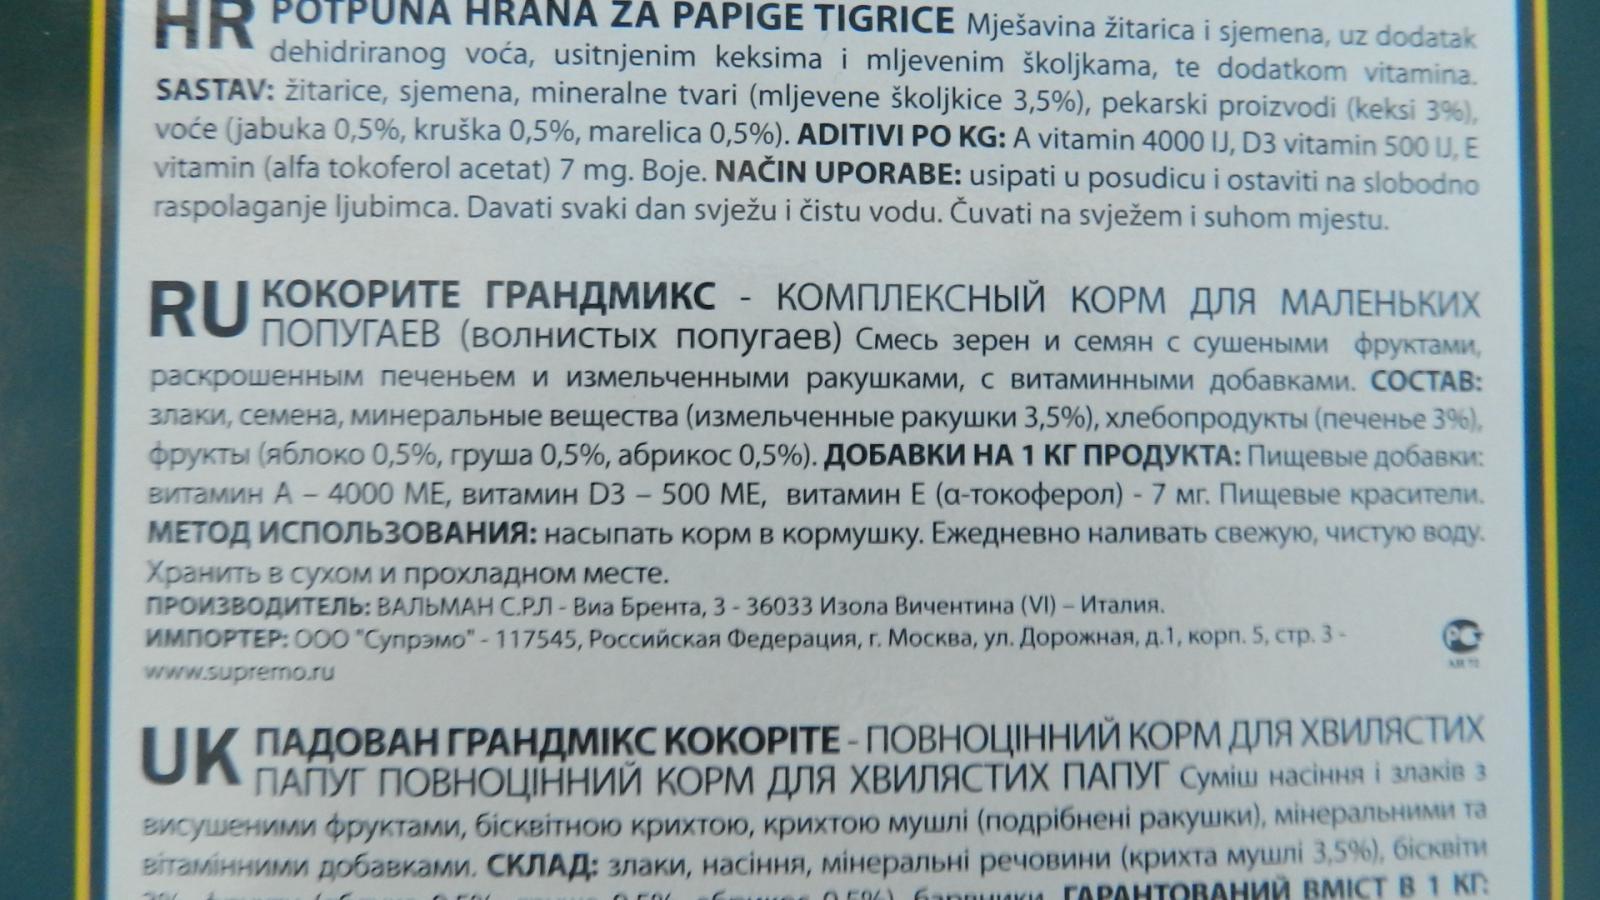 Состав грандмикс - тыл грандмикс.JPG